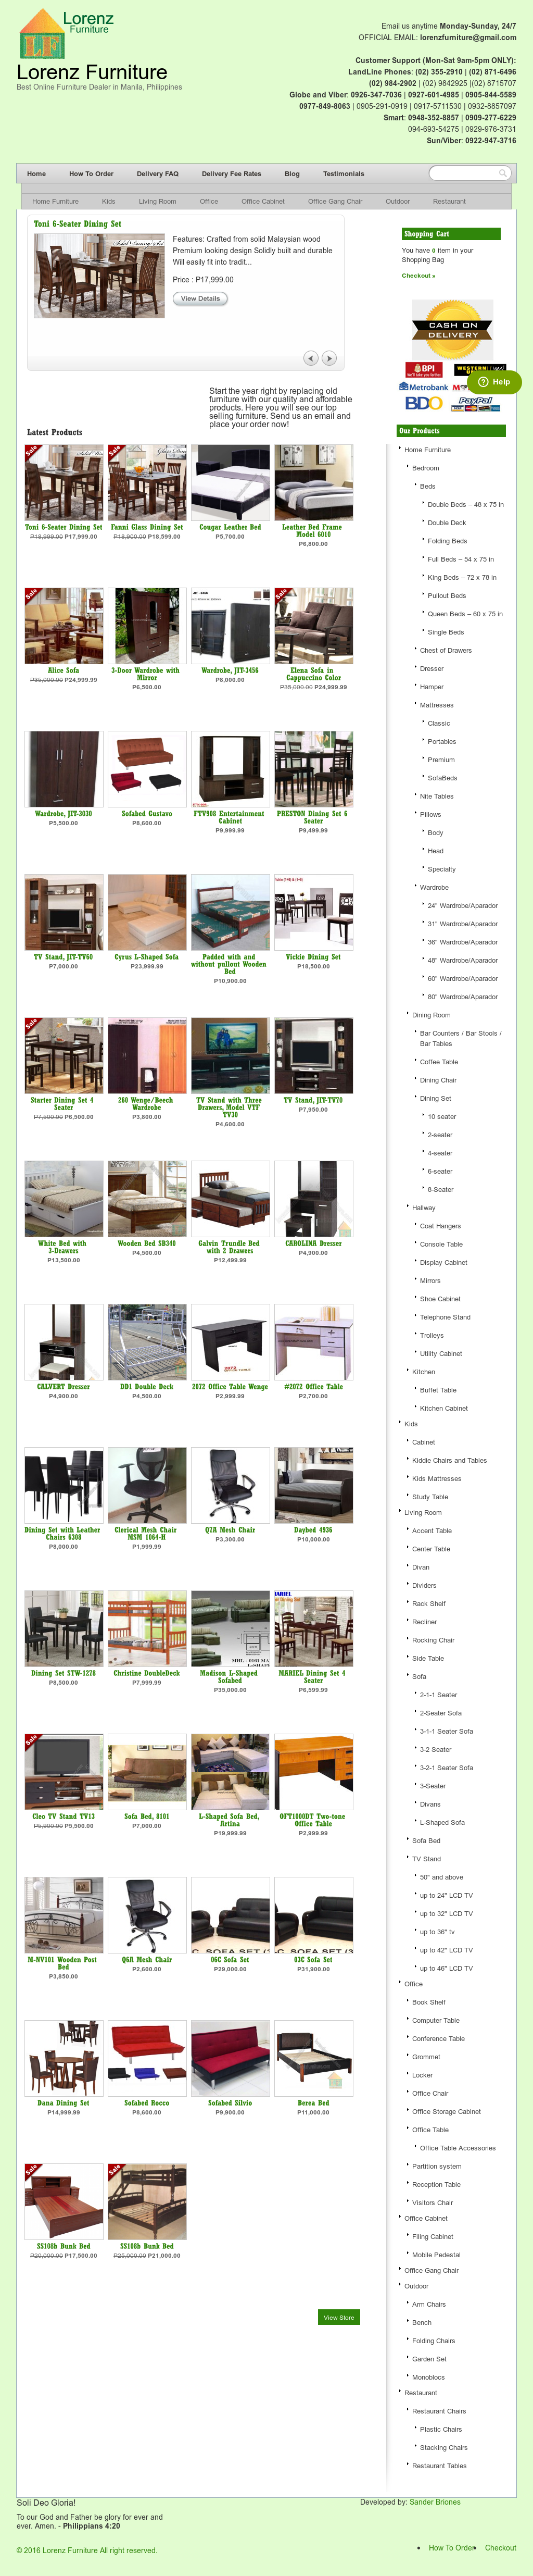 Lorenz Furniture Website History